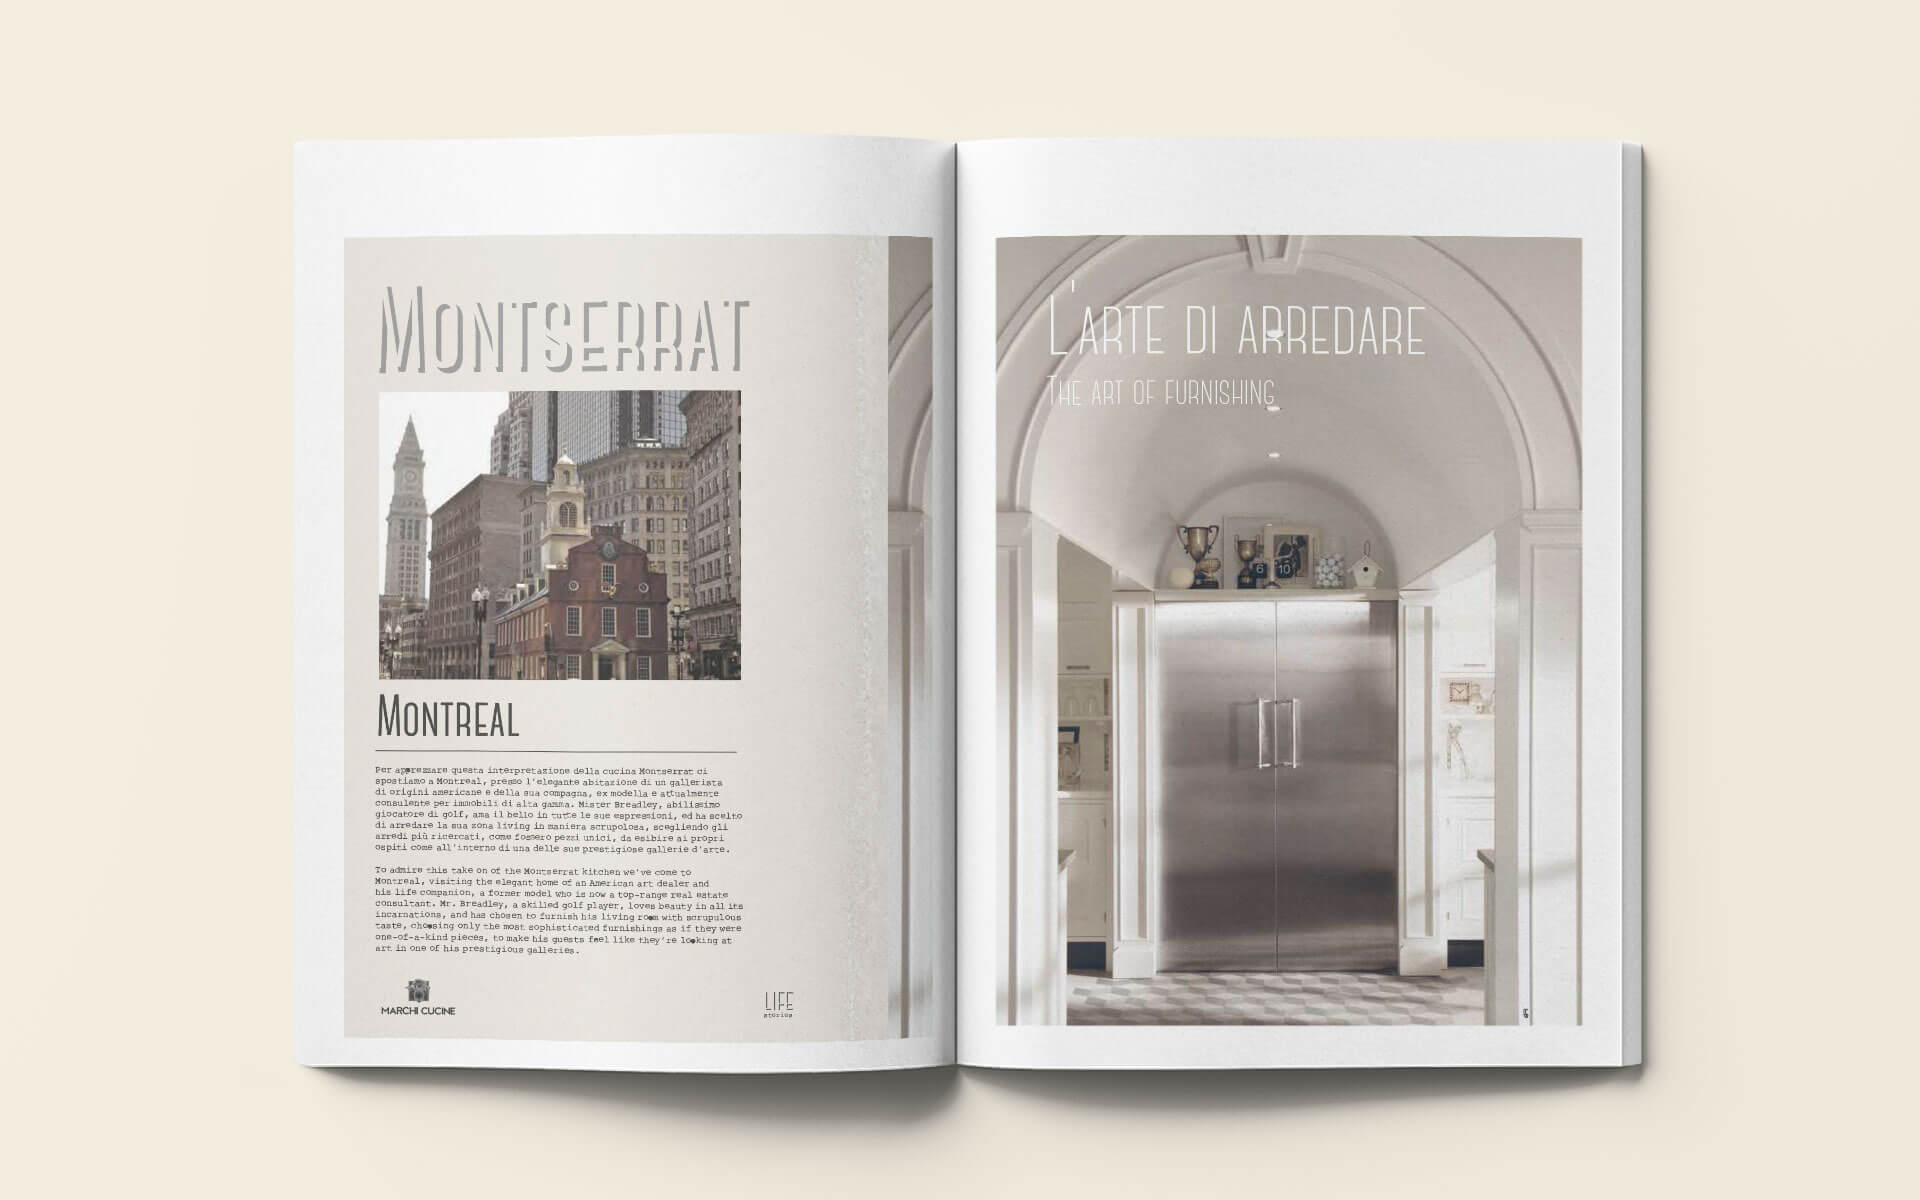 Catalogo Montserrat - Marchi Cucine Made in Italy